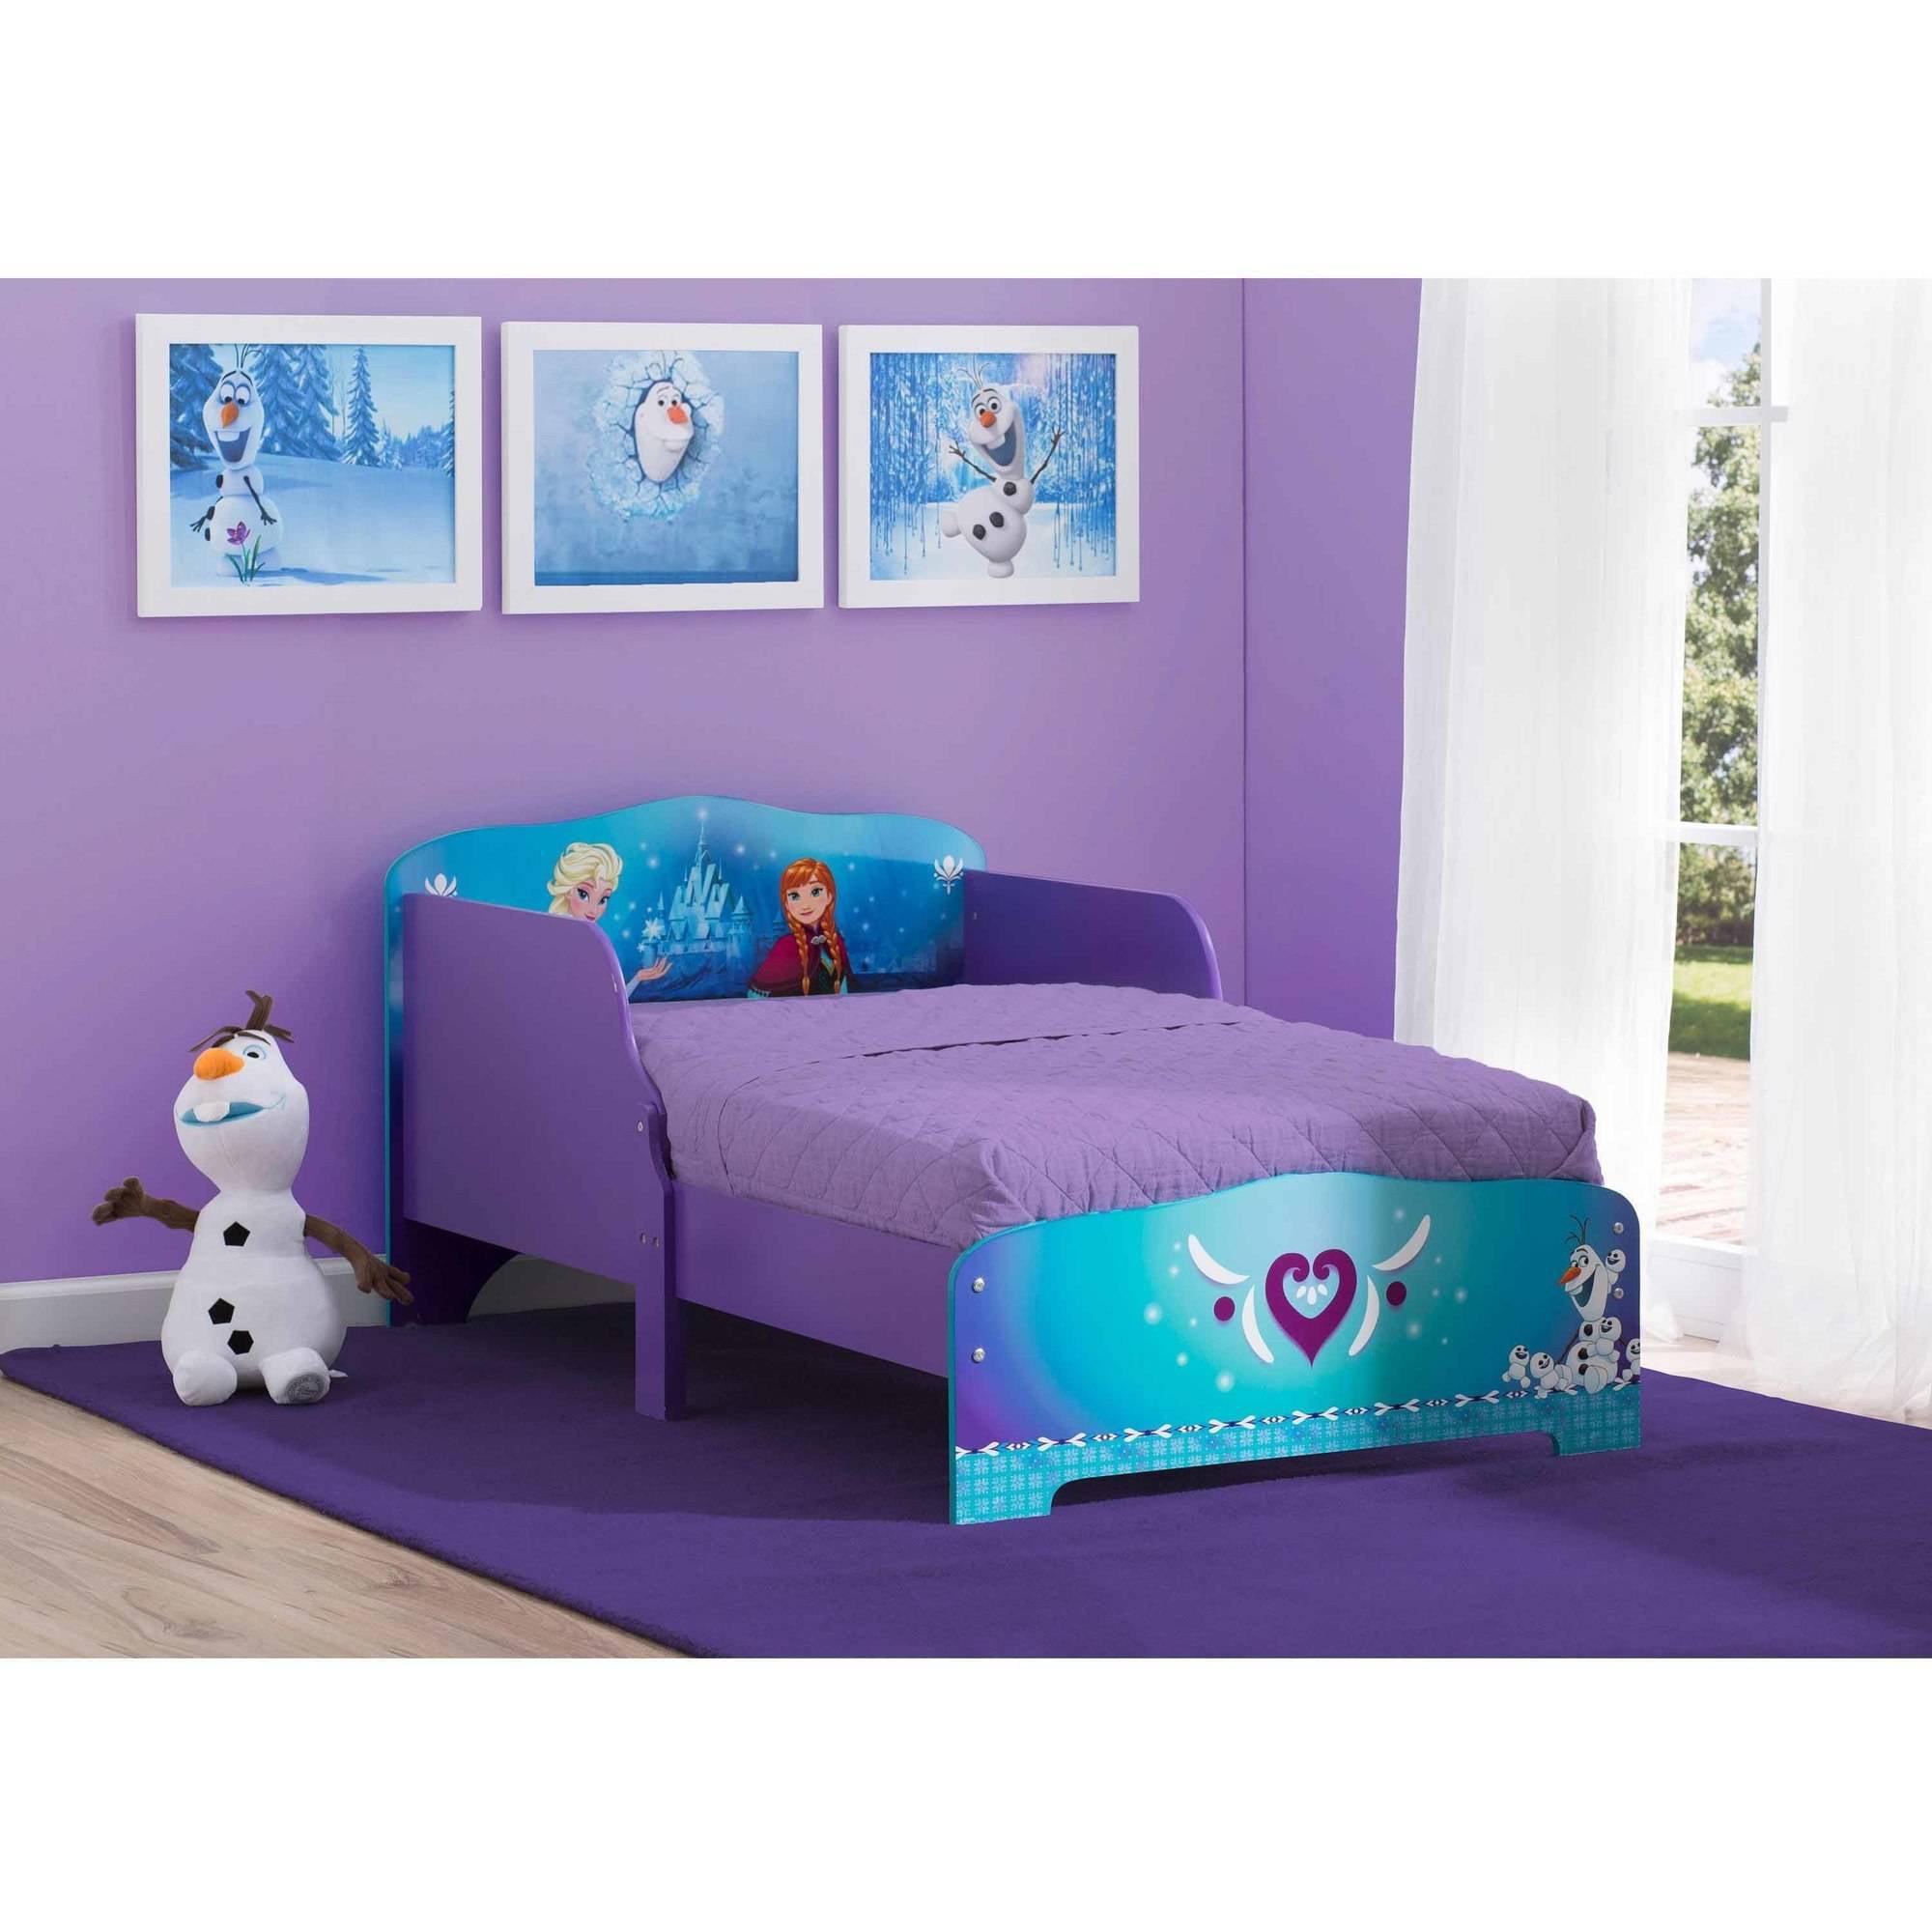 Superior Disney Frozen Wood Toddler Bed   Walmart.com